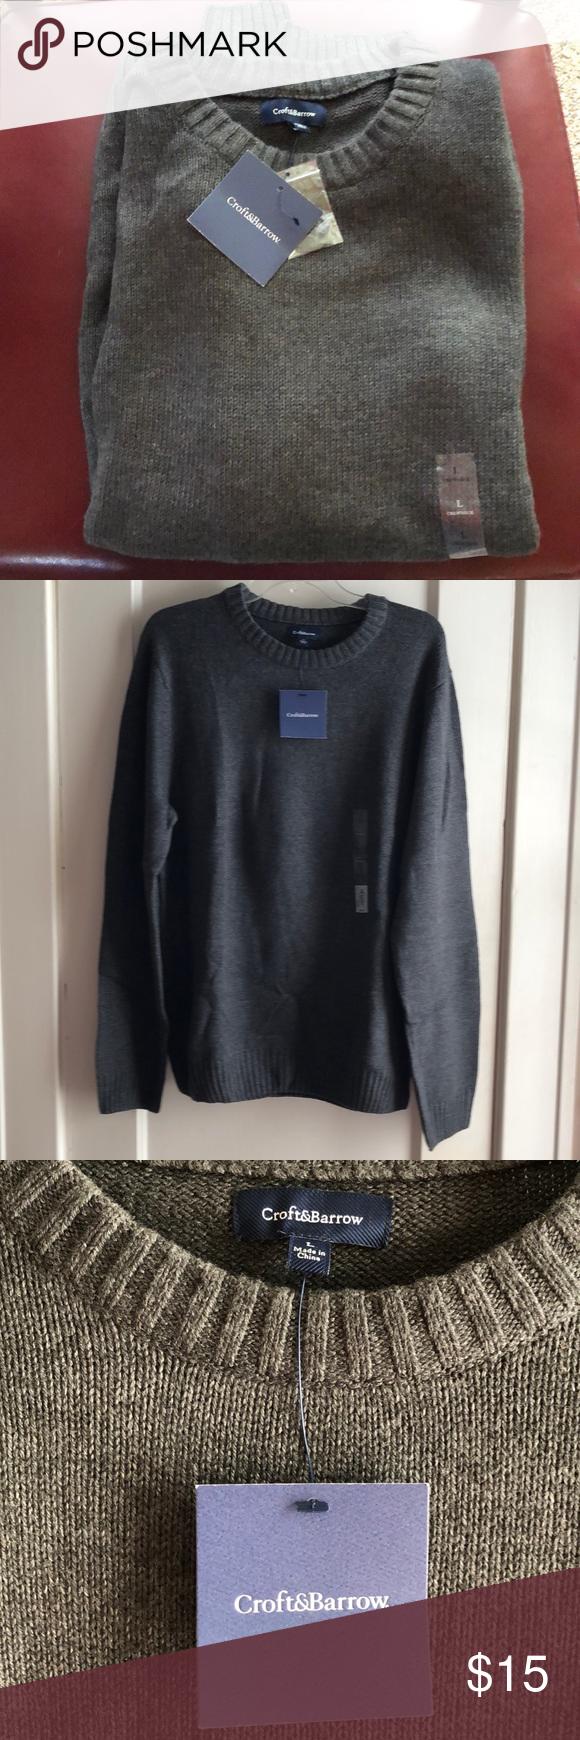 Croft Barrow Gray Crewneck Sweater Grey Crewneck Crew Neck Sweater Sweaters [ 1740 x 580 Pixel ]